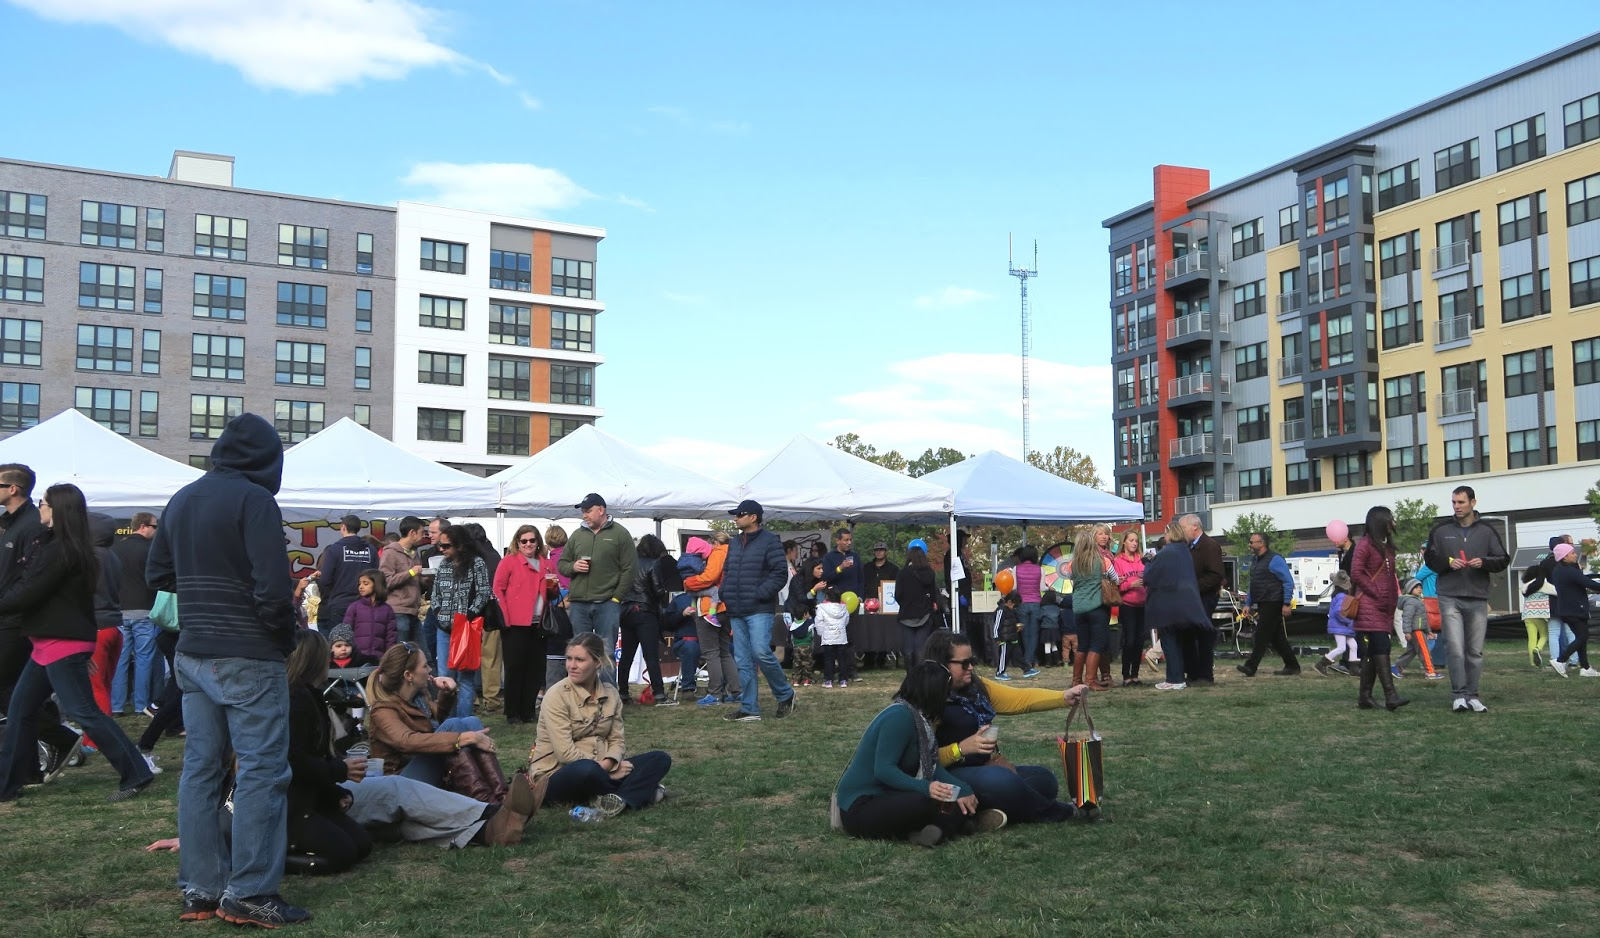 The Annandale Blog Merrifield Fall Festival Shines A Spotlight On Mosaic District